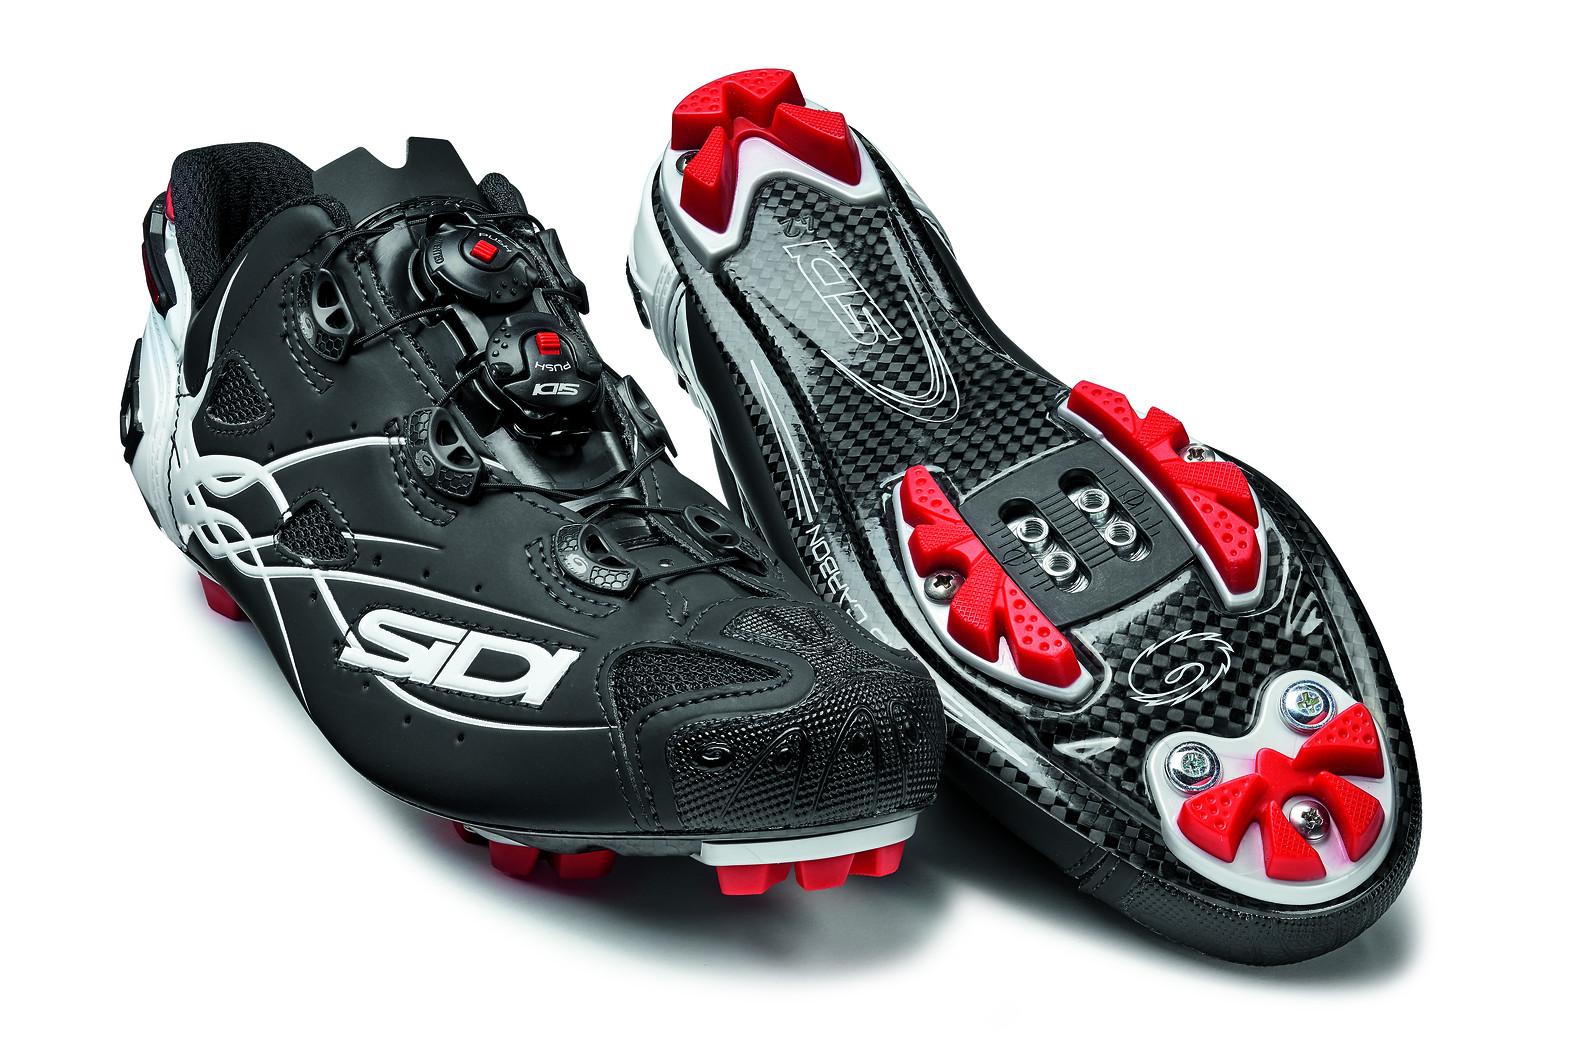 Sidi Tiger Carbon MTB Shoe - Reviews